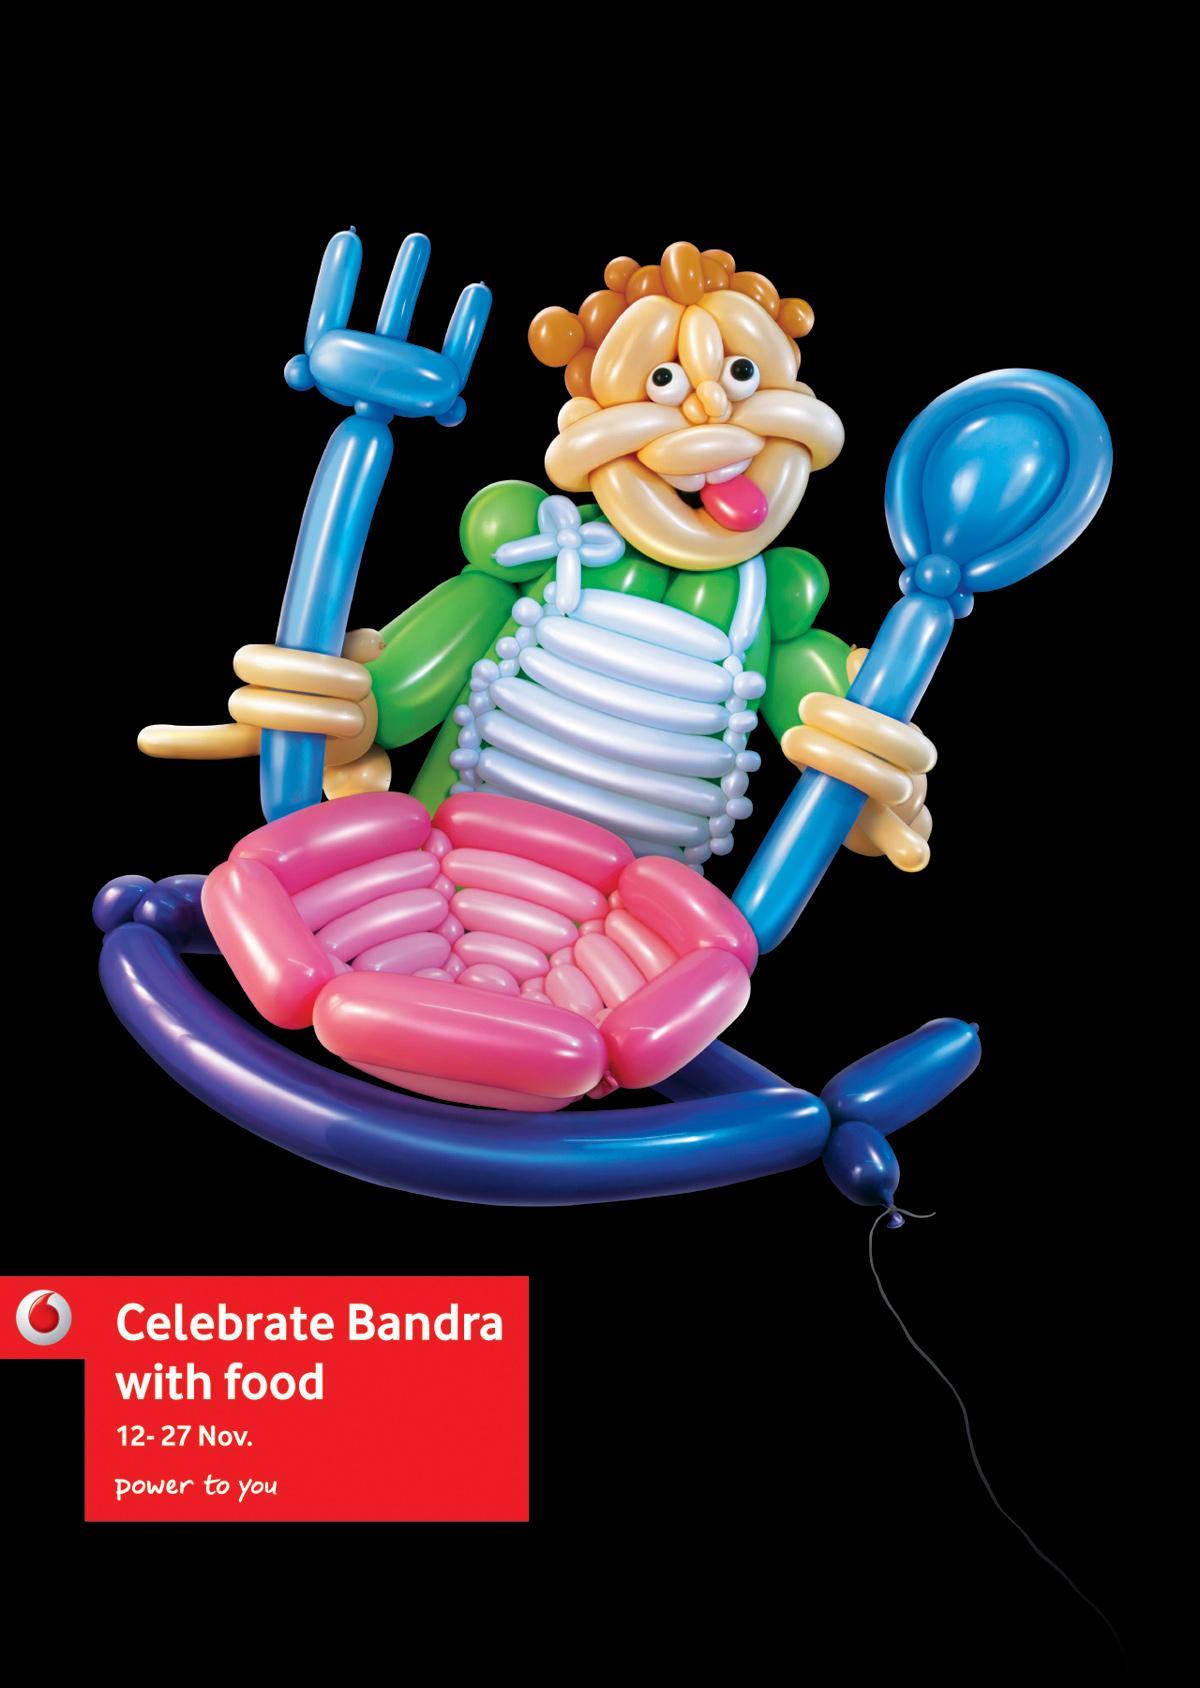 Vodafone Print Ad -  Celebrate Bandra, Food fest